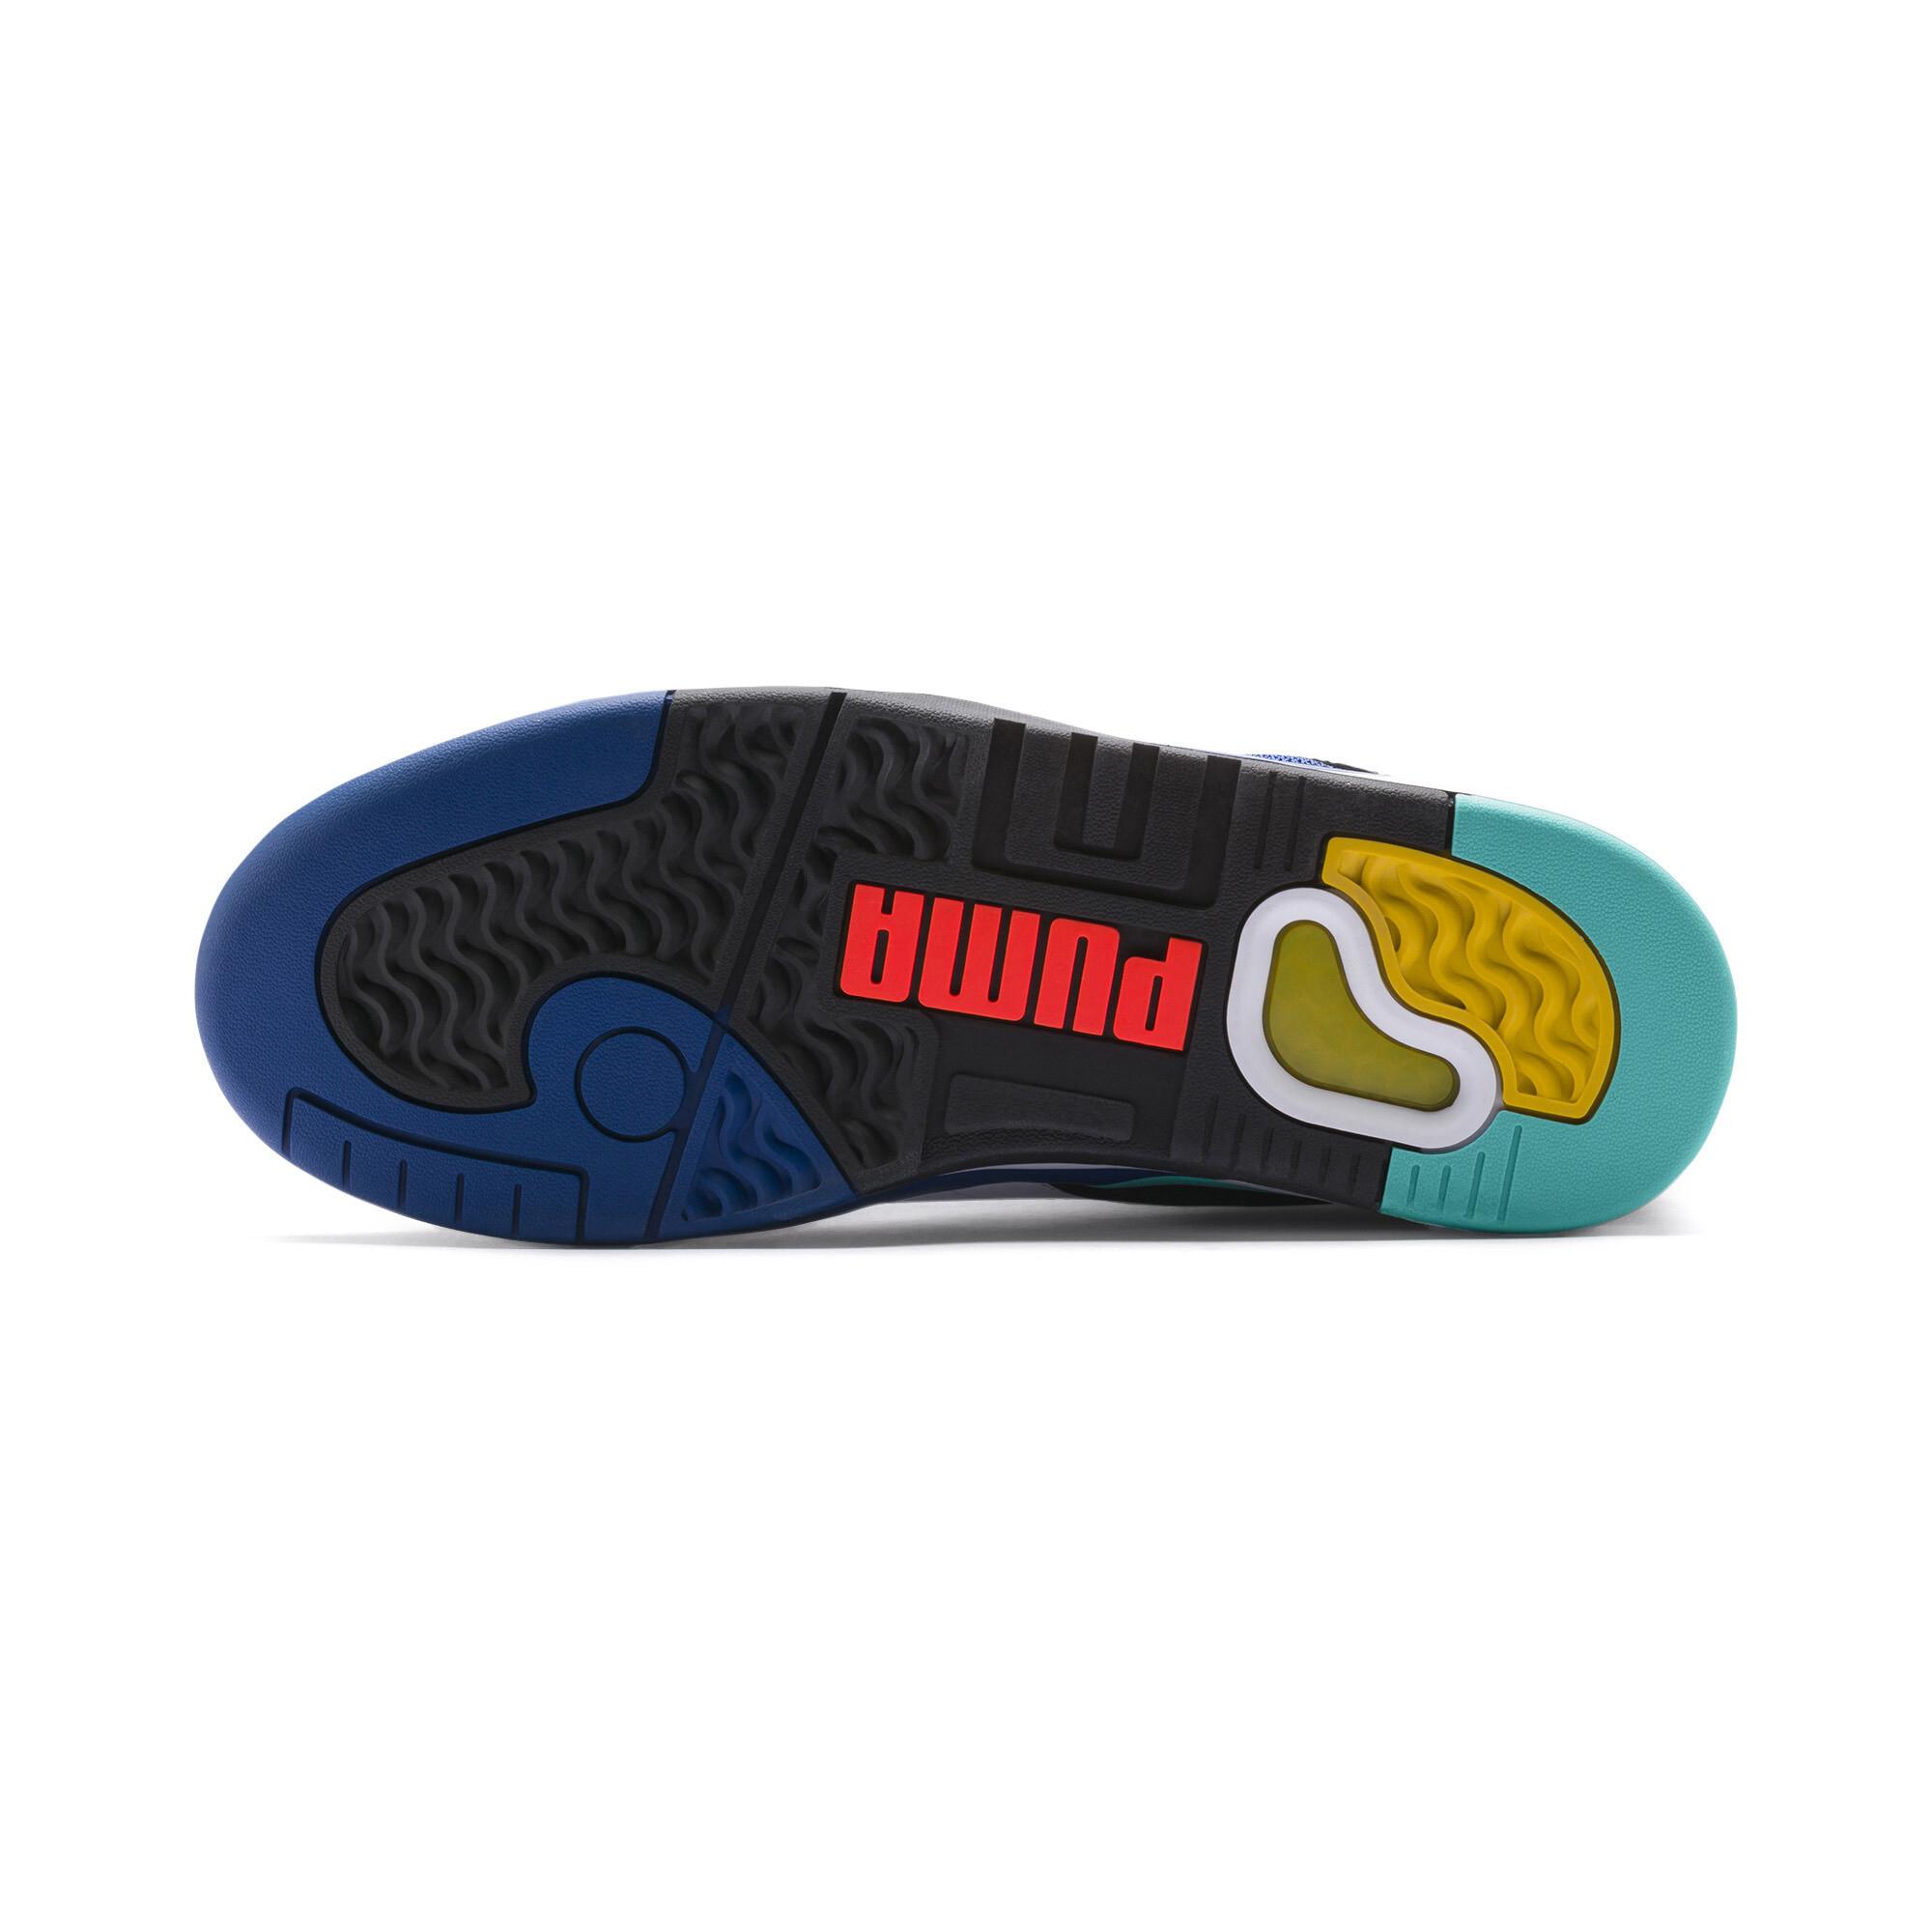 Indexbild 44 - PUMA Palace Guard Sneaker Unisex Schuhe Sport Classics Neu